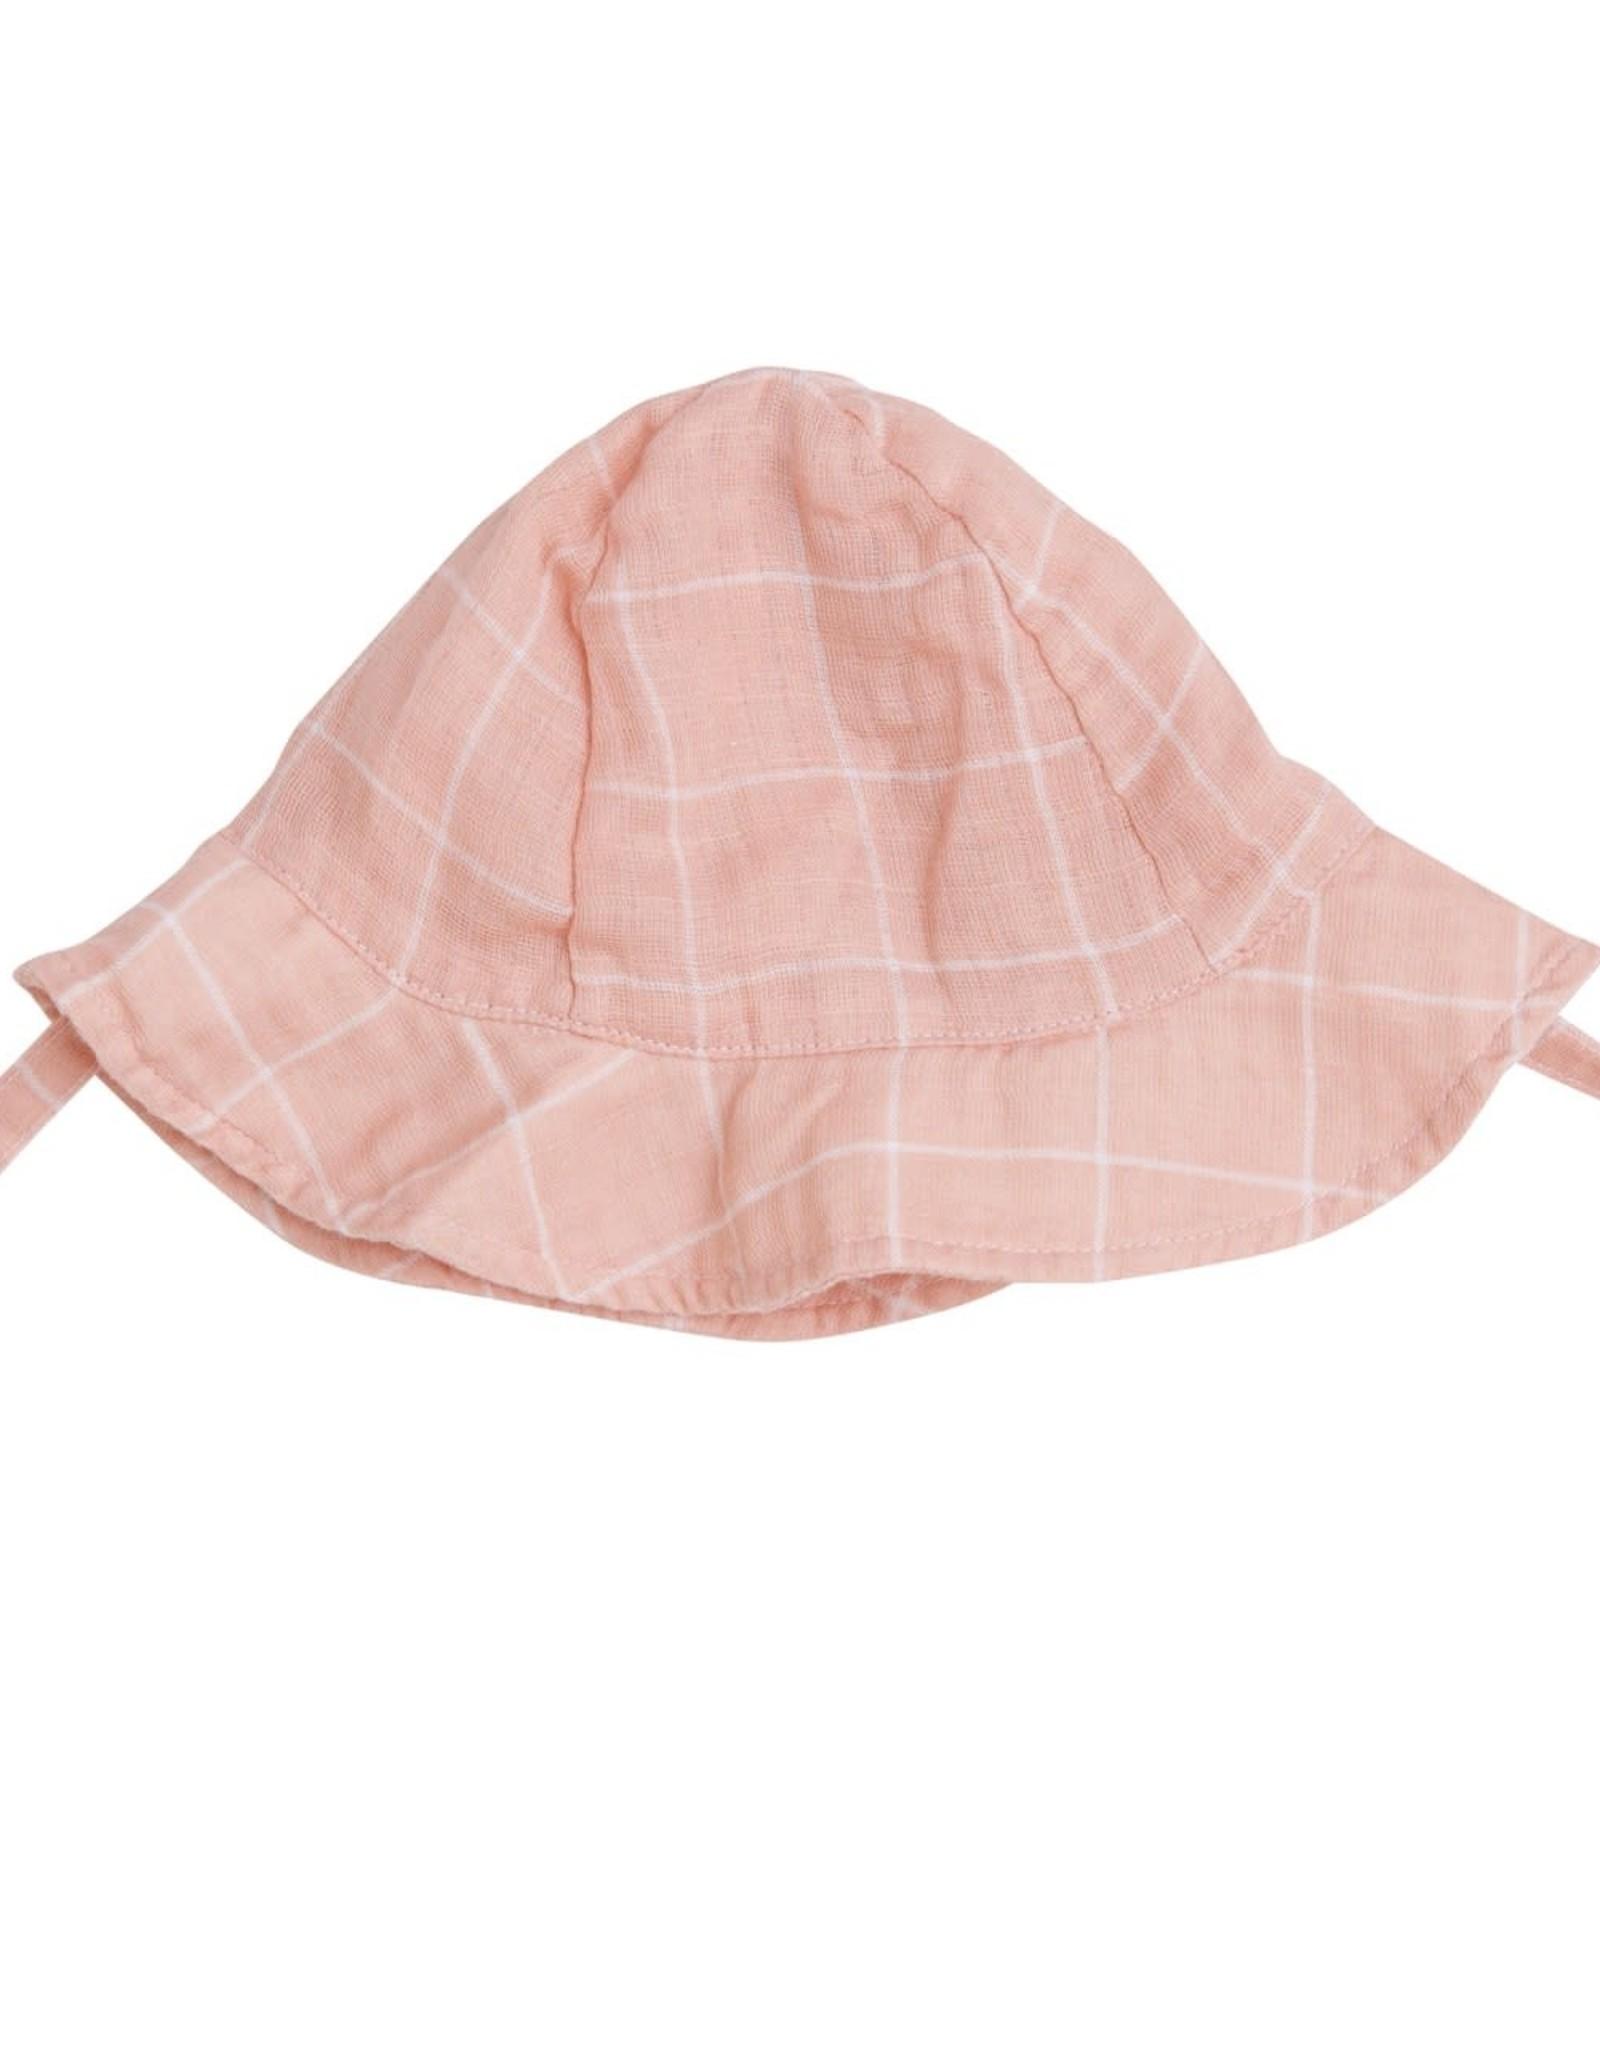 Angel Dear Off the Grid Sunhat, Pink